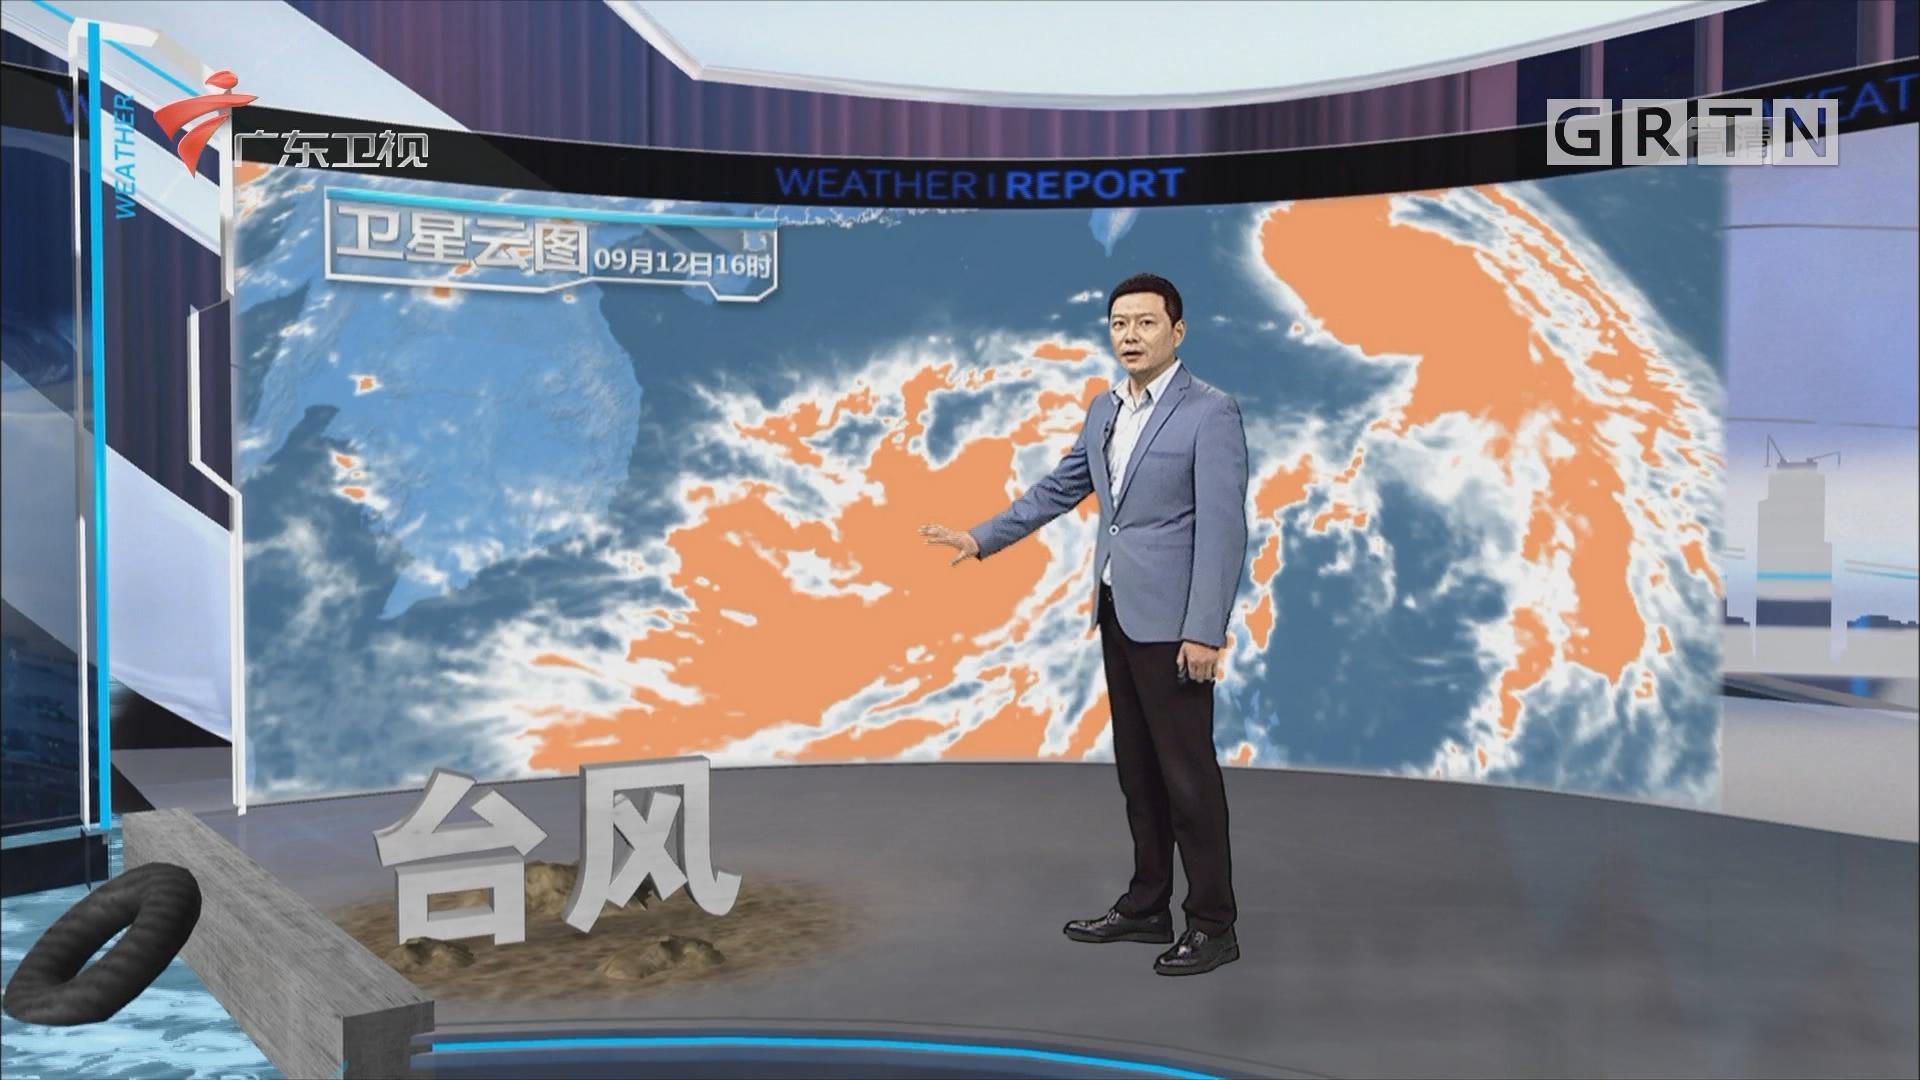 [HD][2017-09-12]广东天气预报